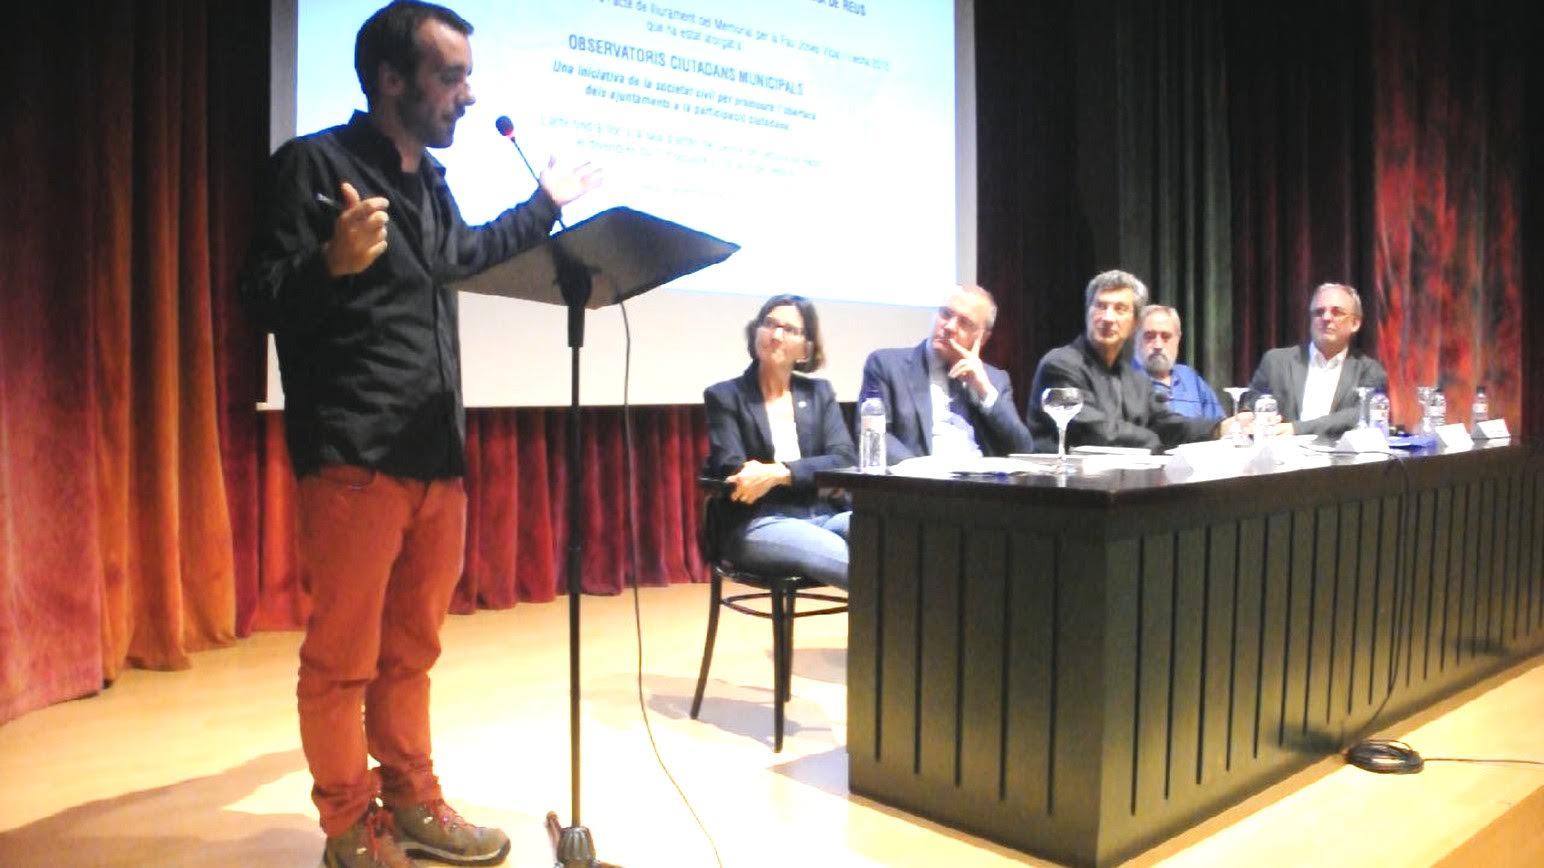 OCM Memorial Josep Vidal Llecha